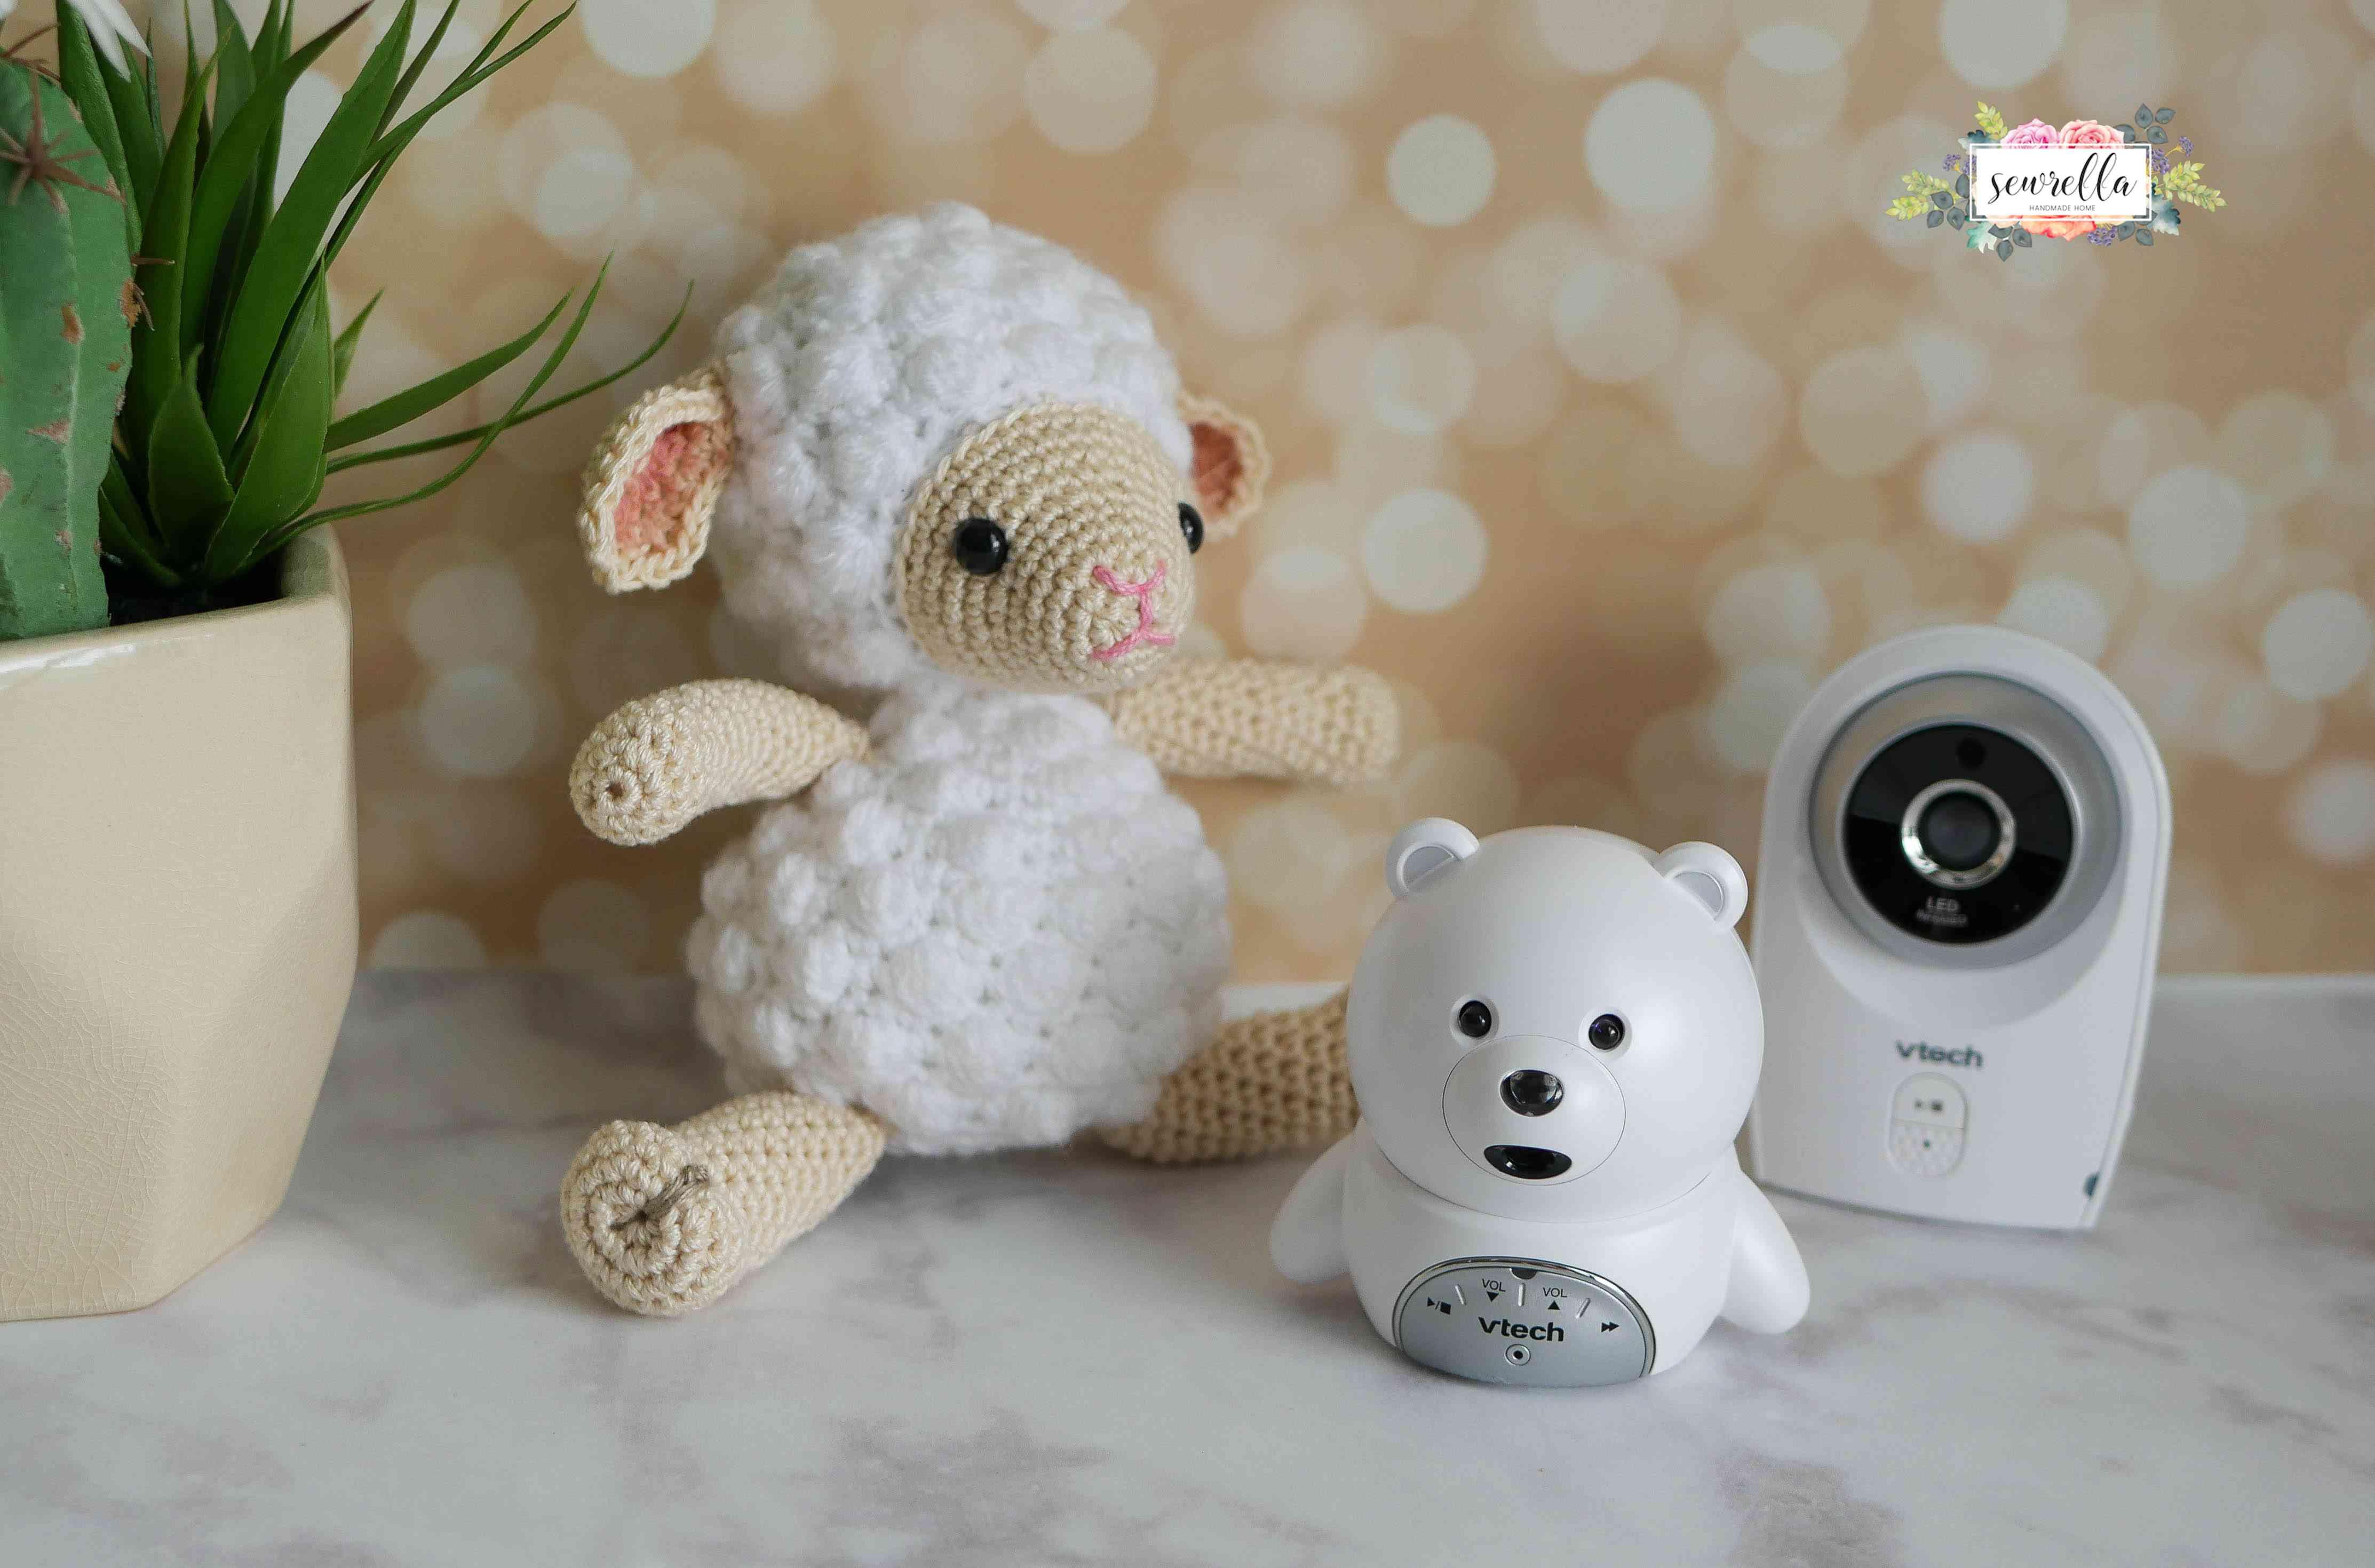 Small white crochet lamb next to baby monitors.